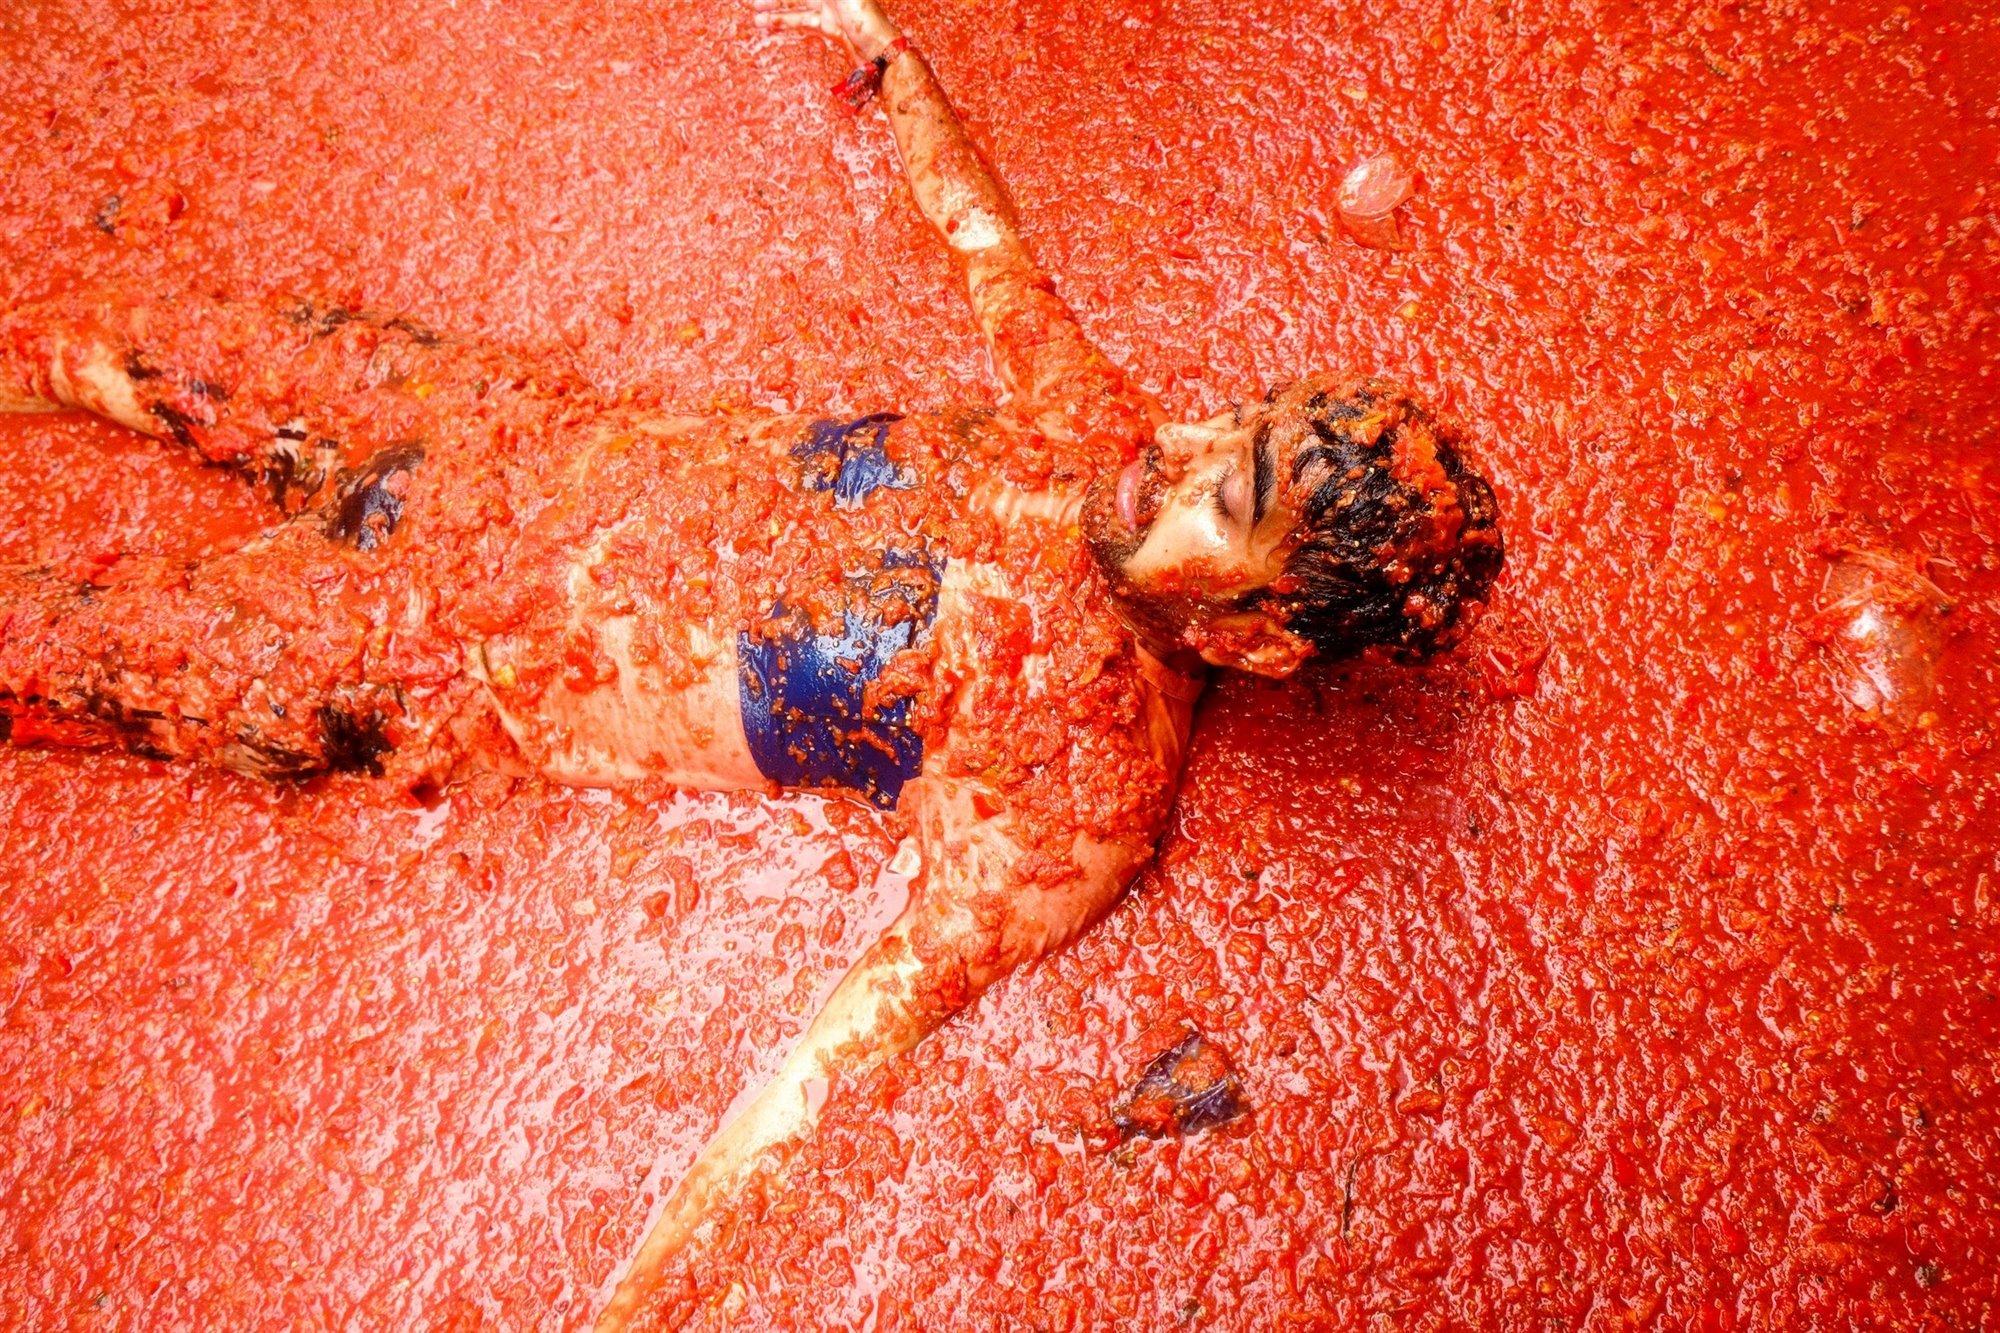 V47-2930491. El secreto de la tomatina es que los tomates estén muy maduros